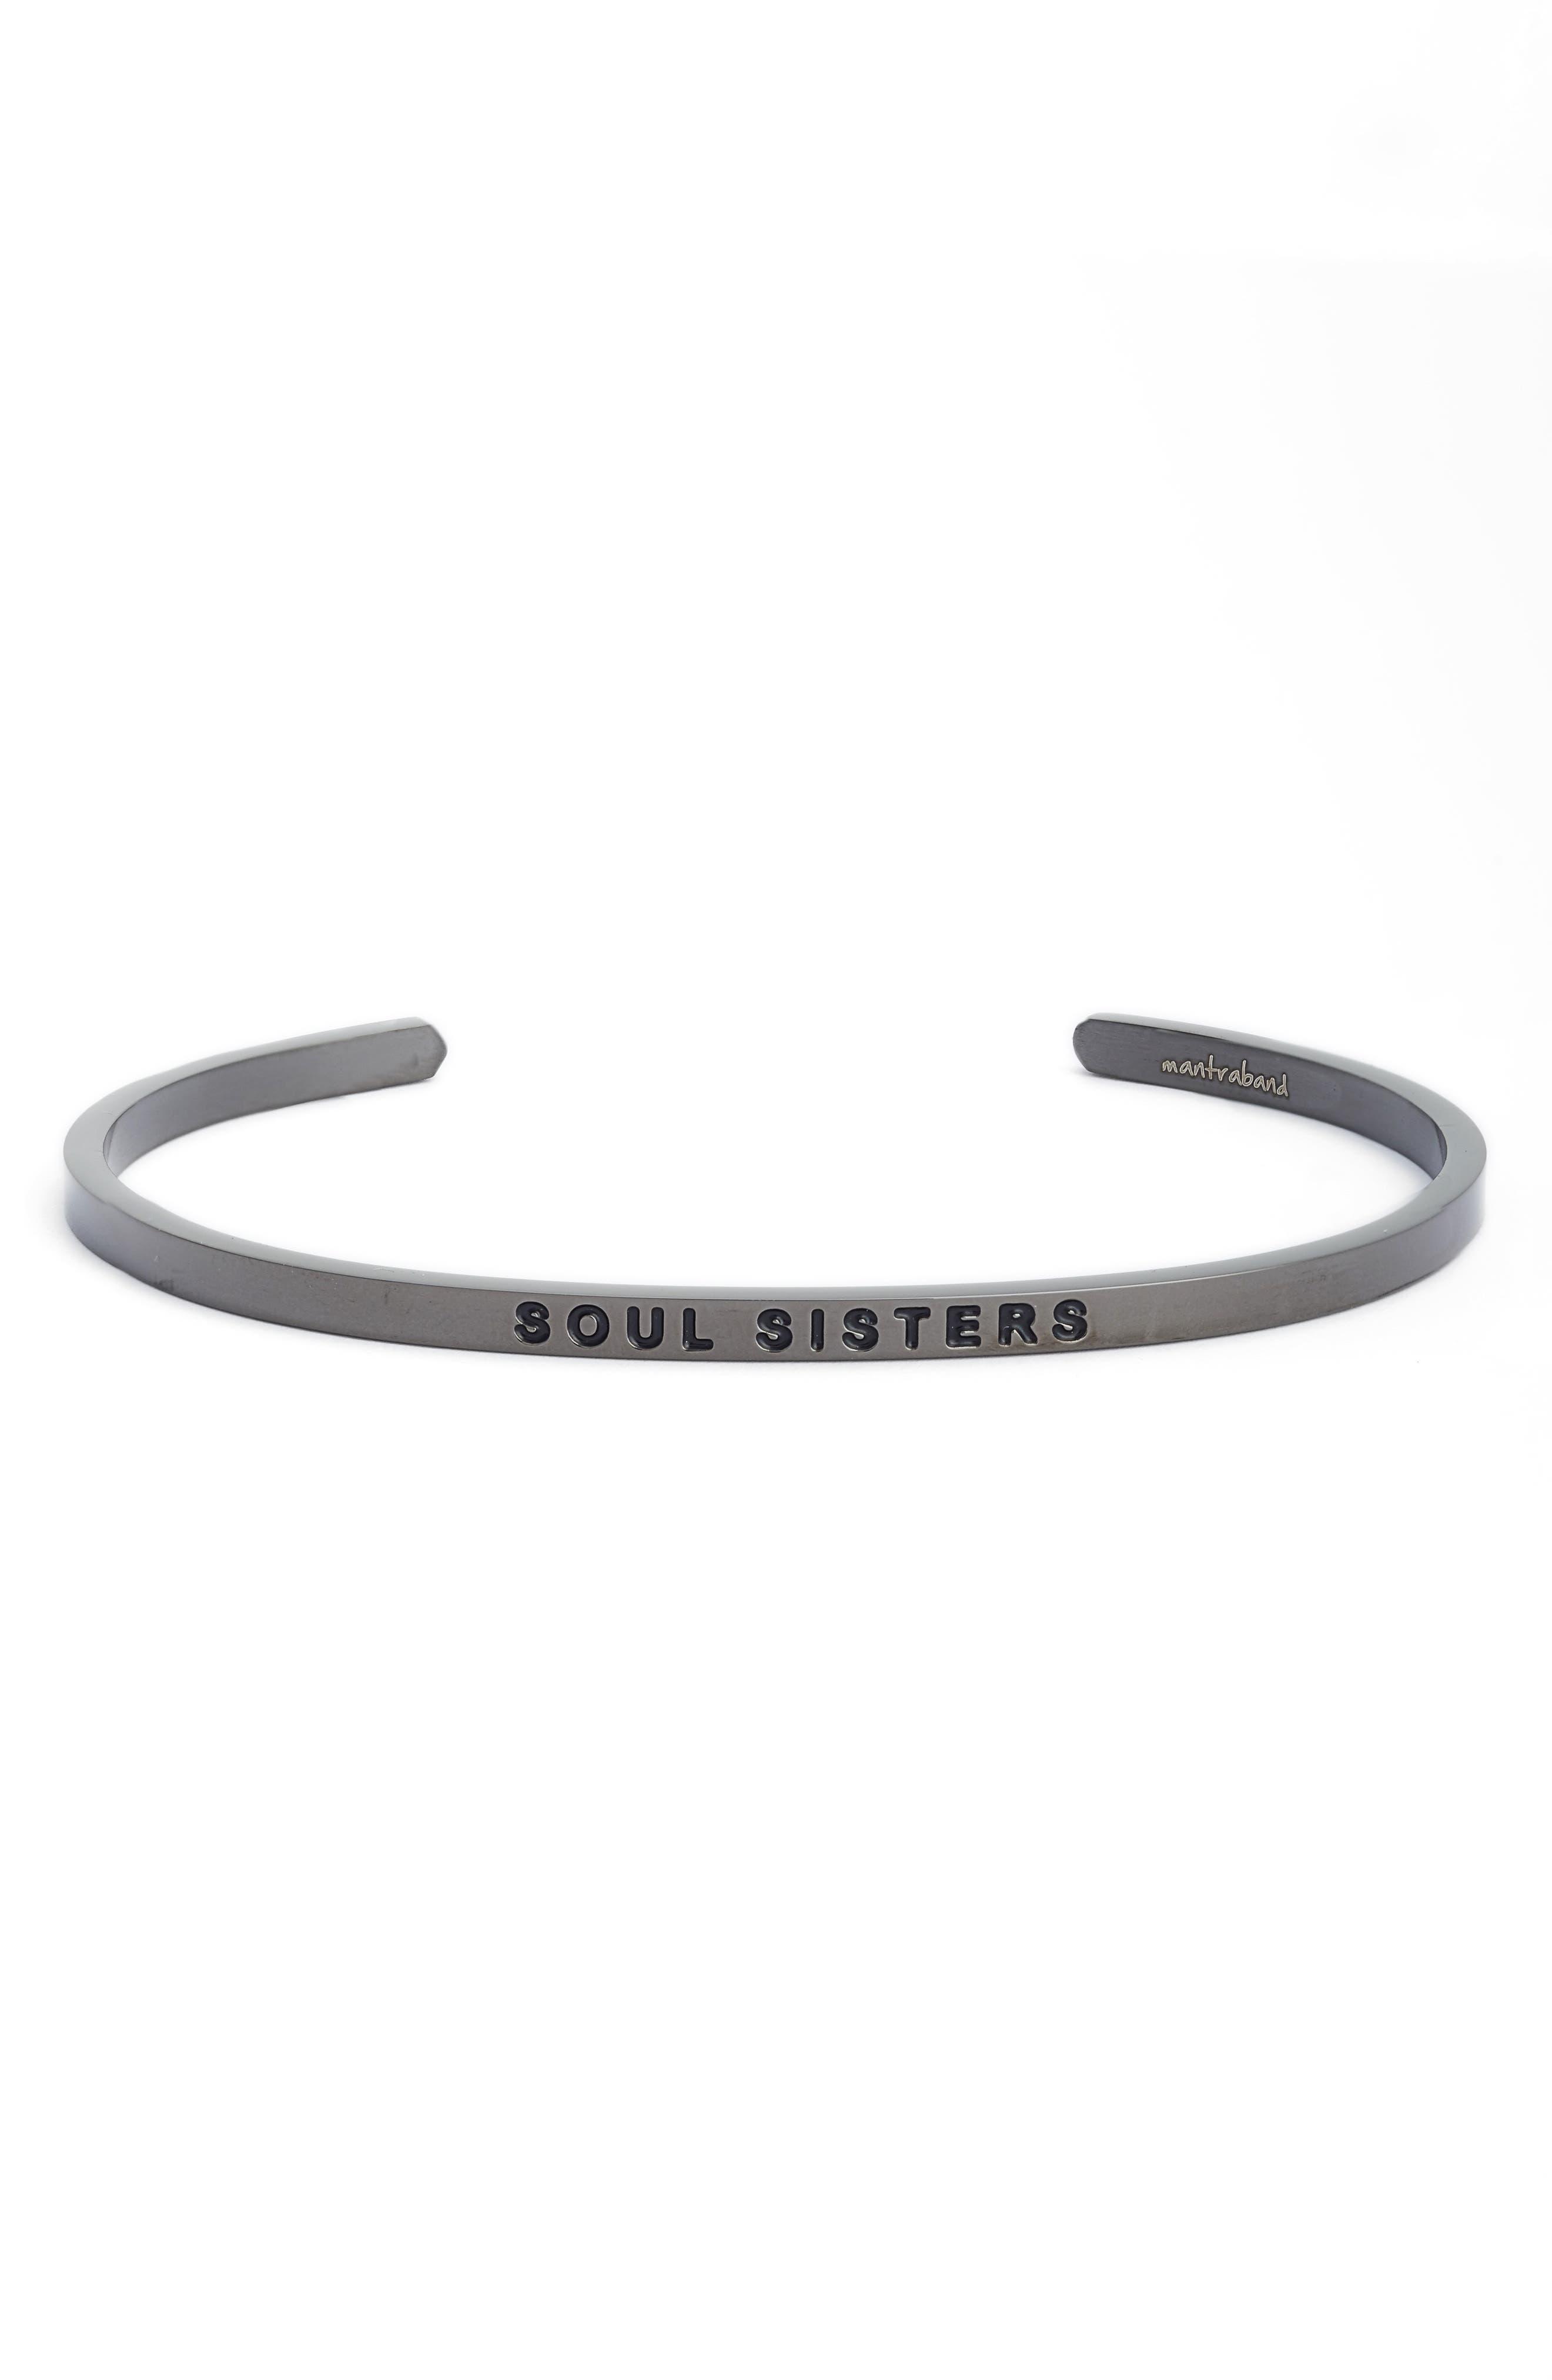 Soul Sisters Cuff Bracelet,                         Main,                         color, Moon Gray